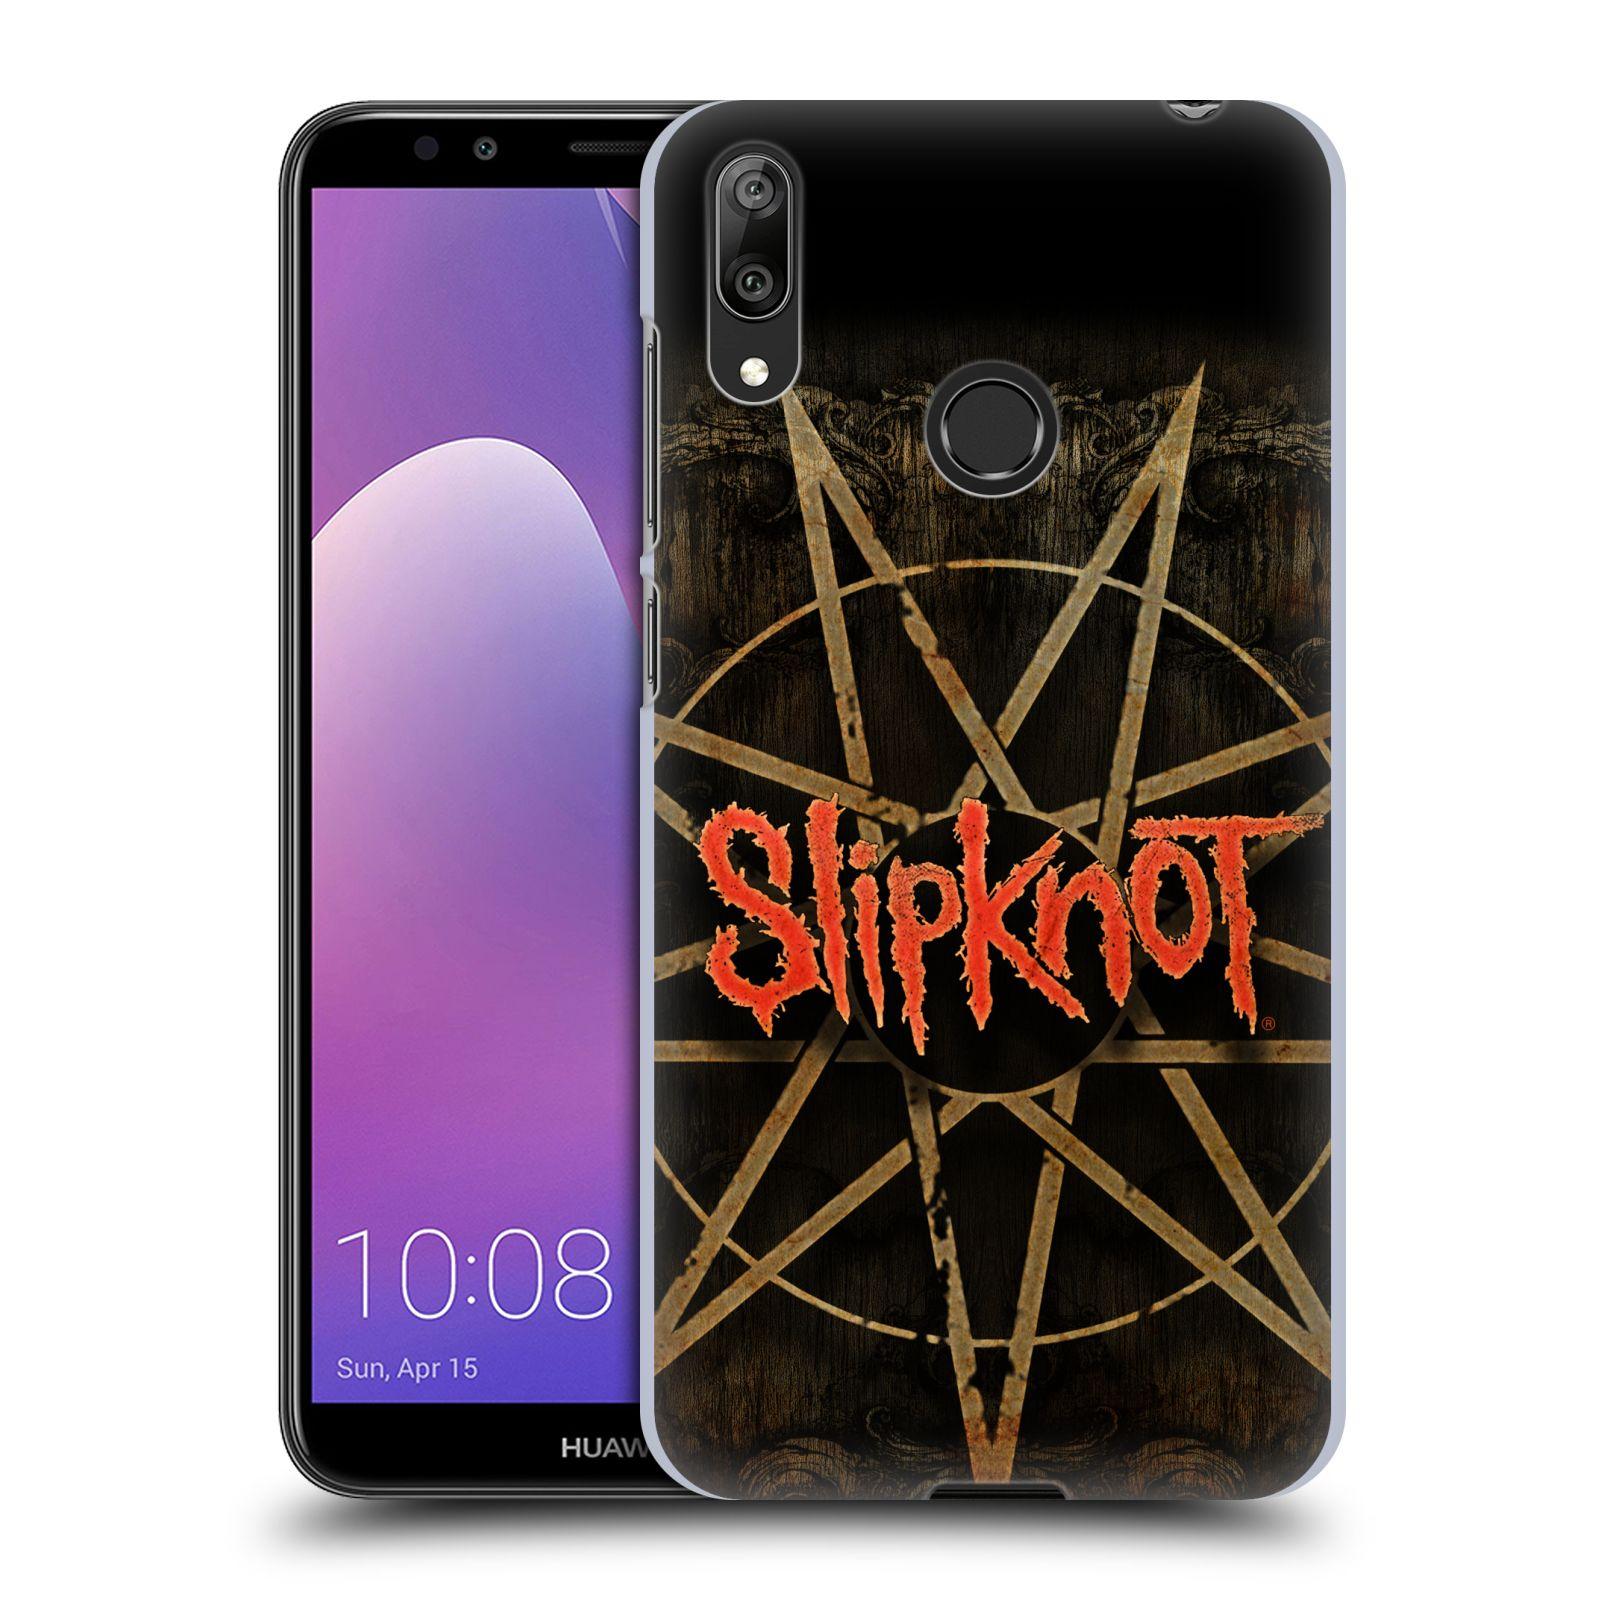 Plastové pouzdro na mobil Huawei Y7 (2019) - Head Case - Slipknot - Znak